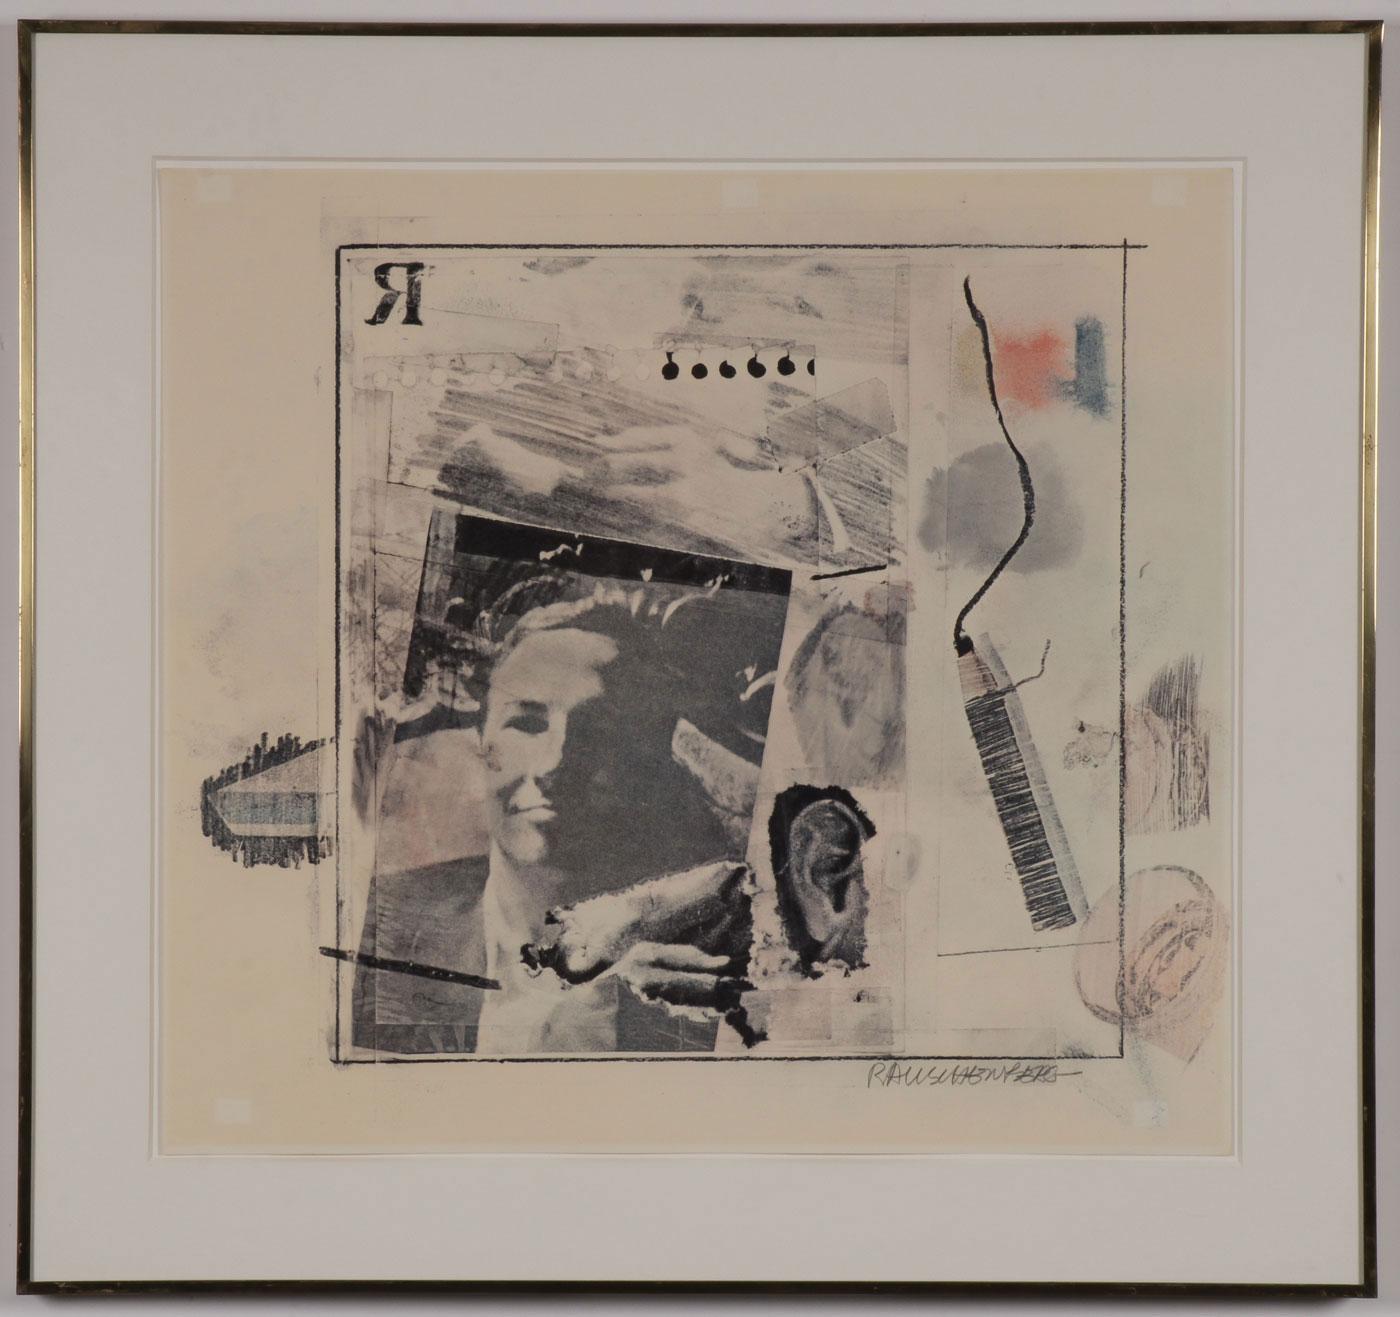 ROBERT RAUSCHENBERG SIGNED WORK - Image 2 of 4